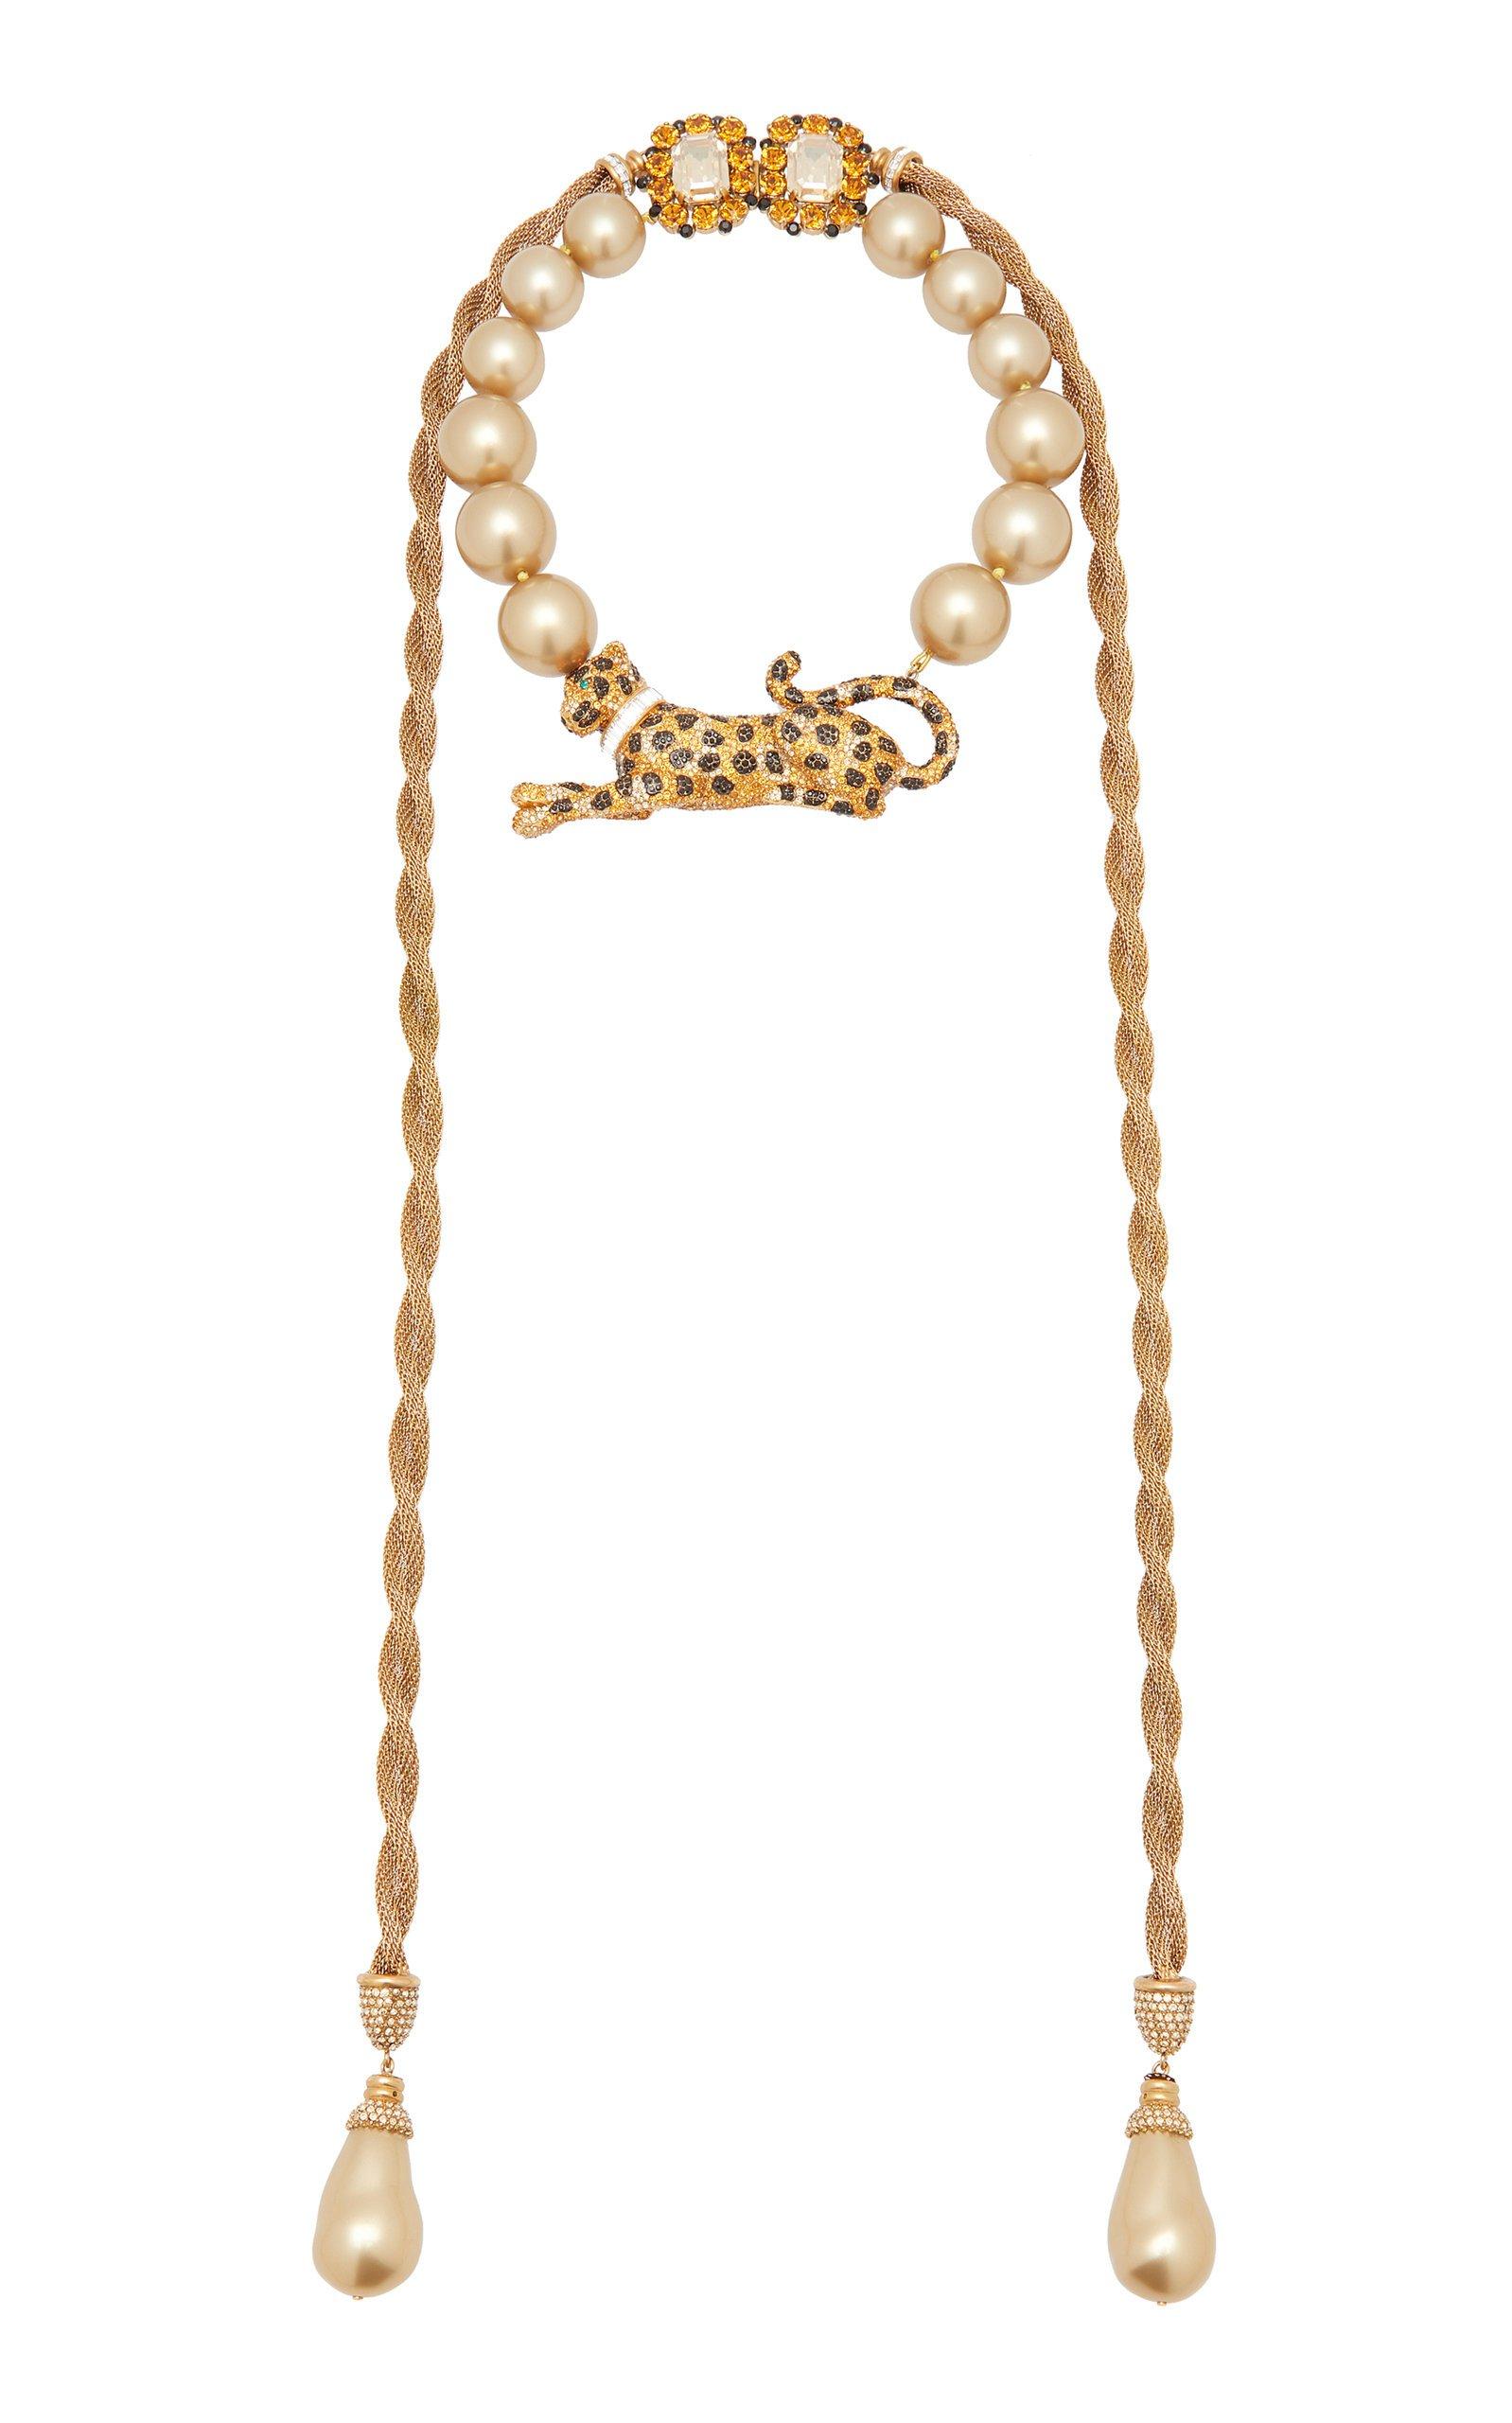 Dolce & Gabbana Maxi Necklace